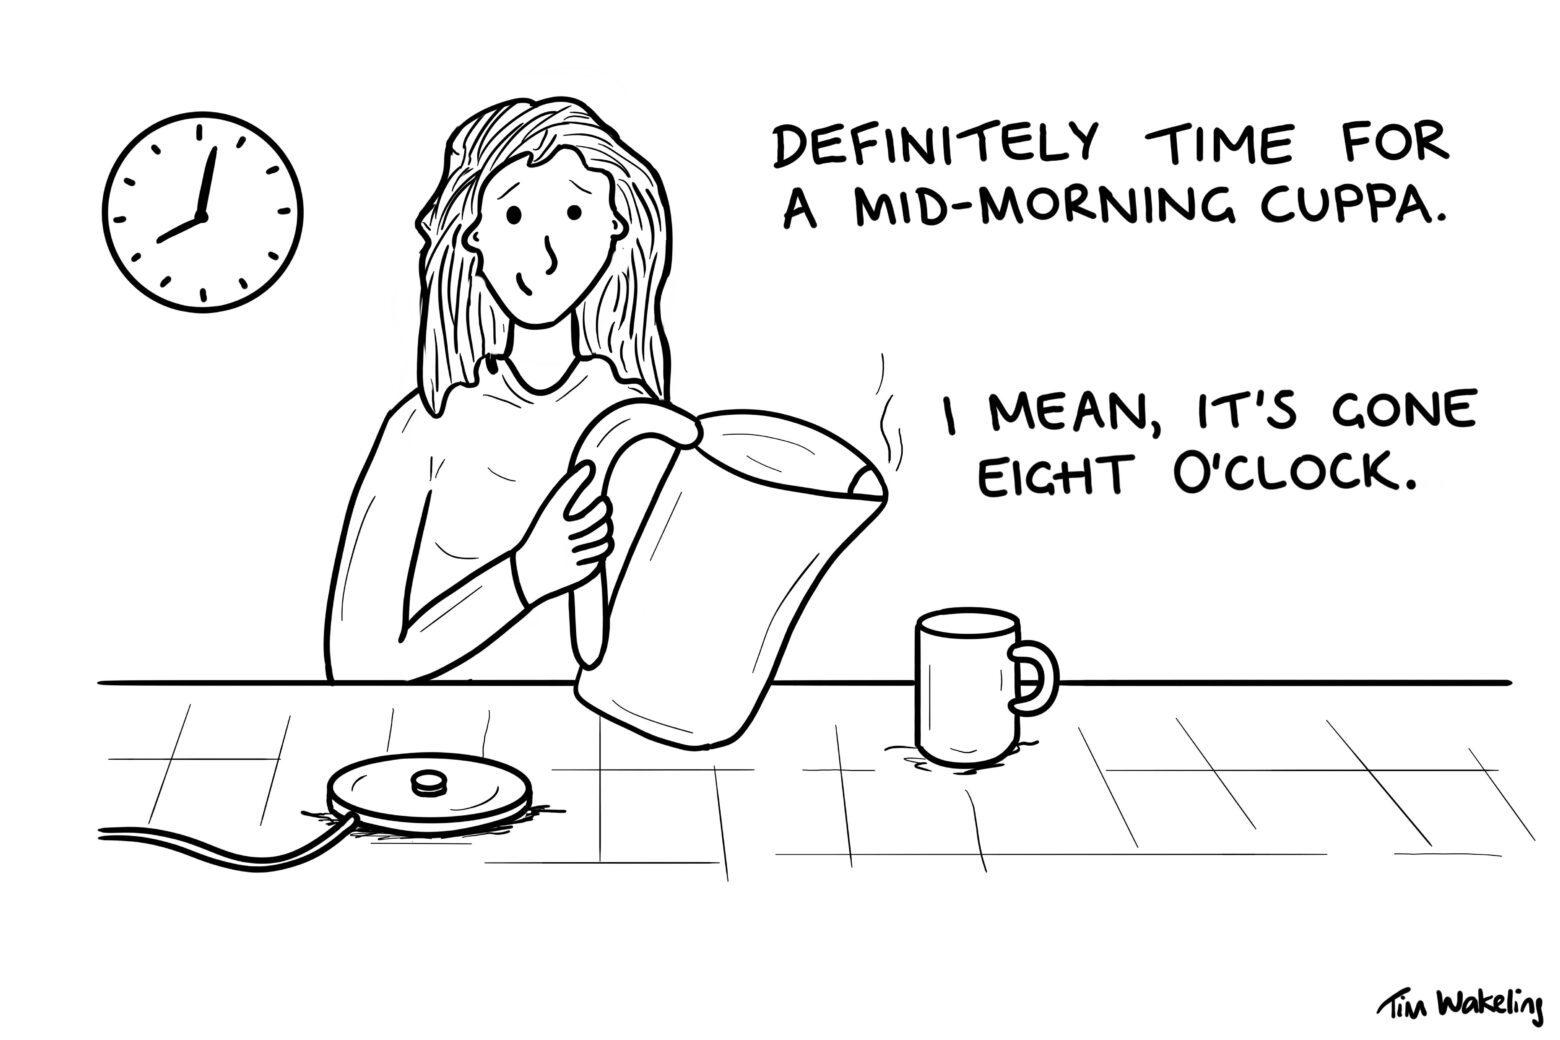 Mid-morning cuppa